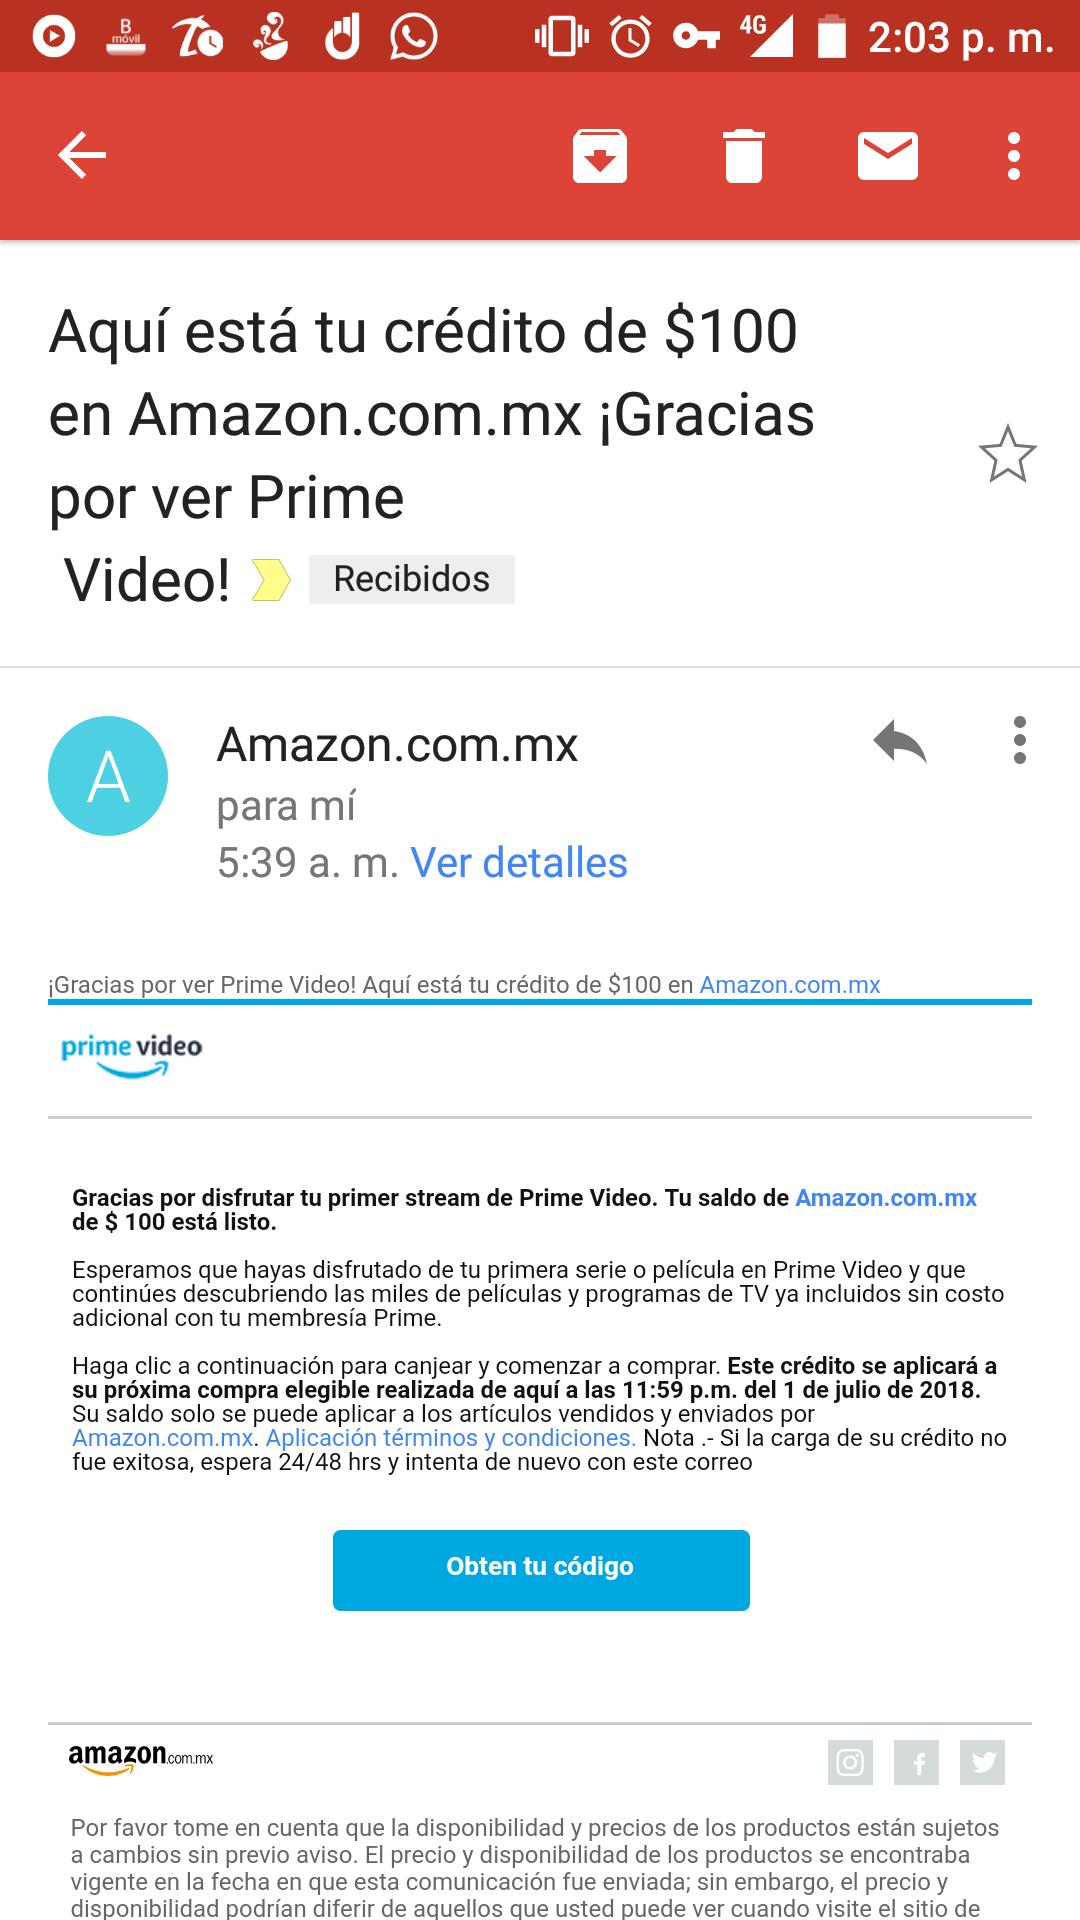 Amazon: $100 de descuento al ver tu primera serie o película en Prime Video (Usuarios seleccionados)